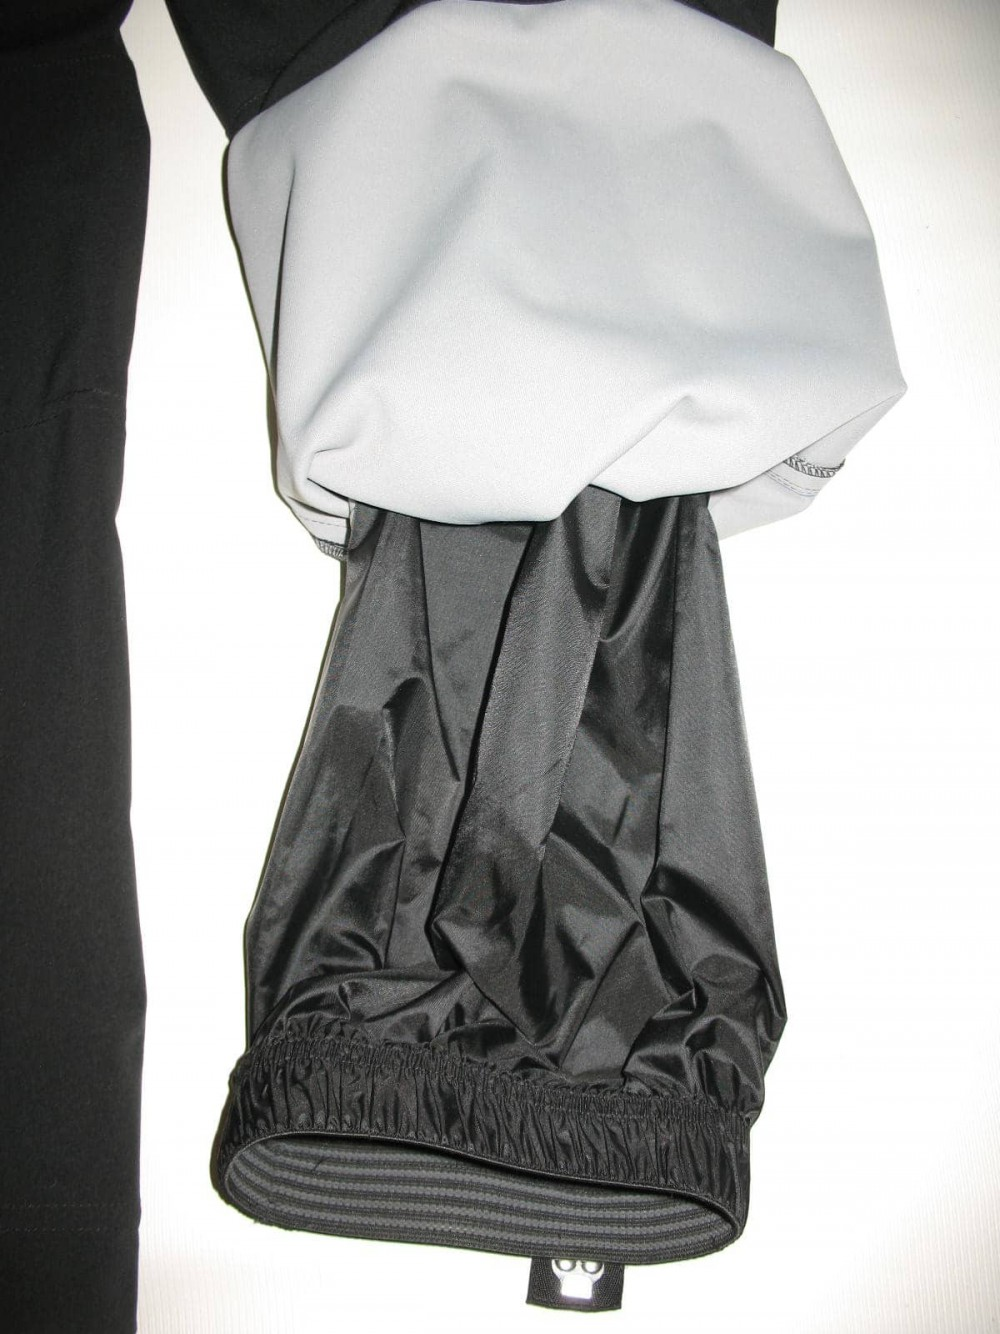 Штаны SCHOFFEL ice trail softshell pants (размер 56/XXL) - 7